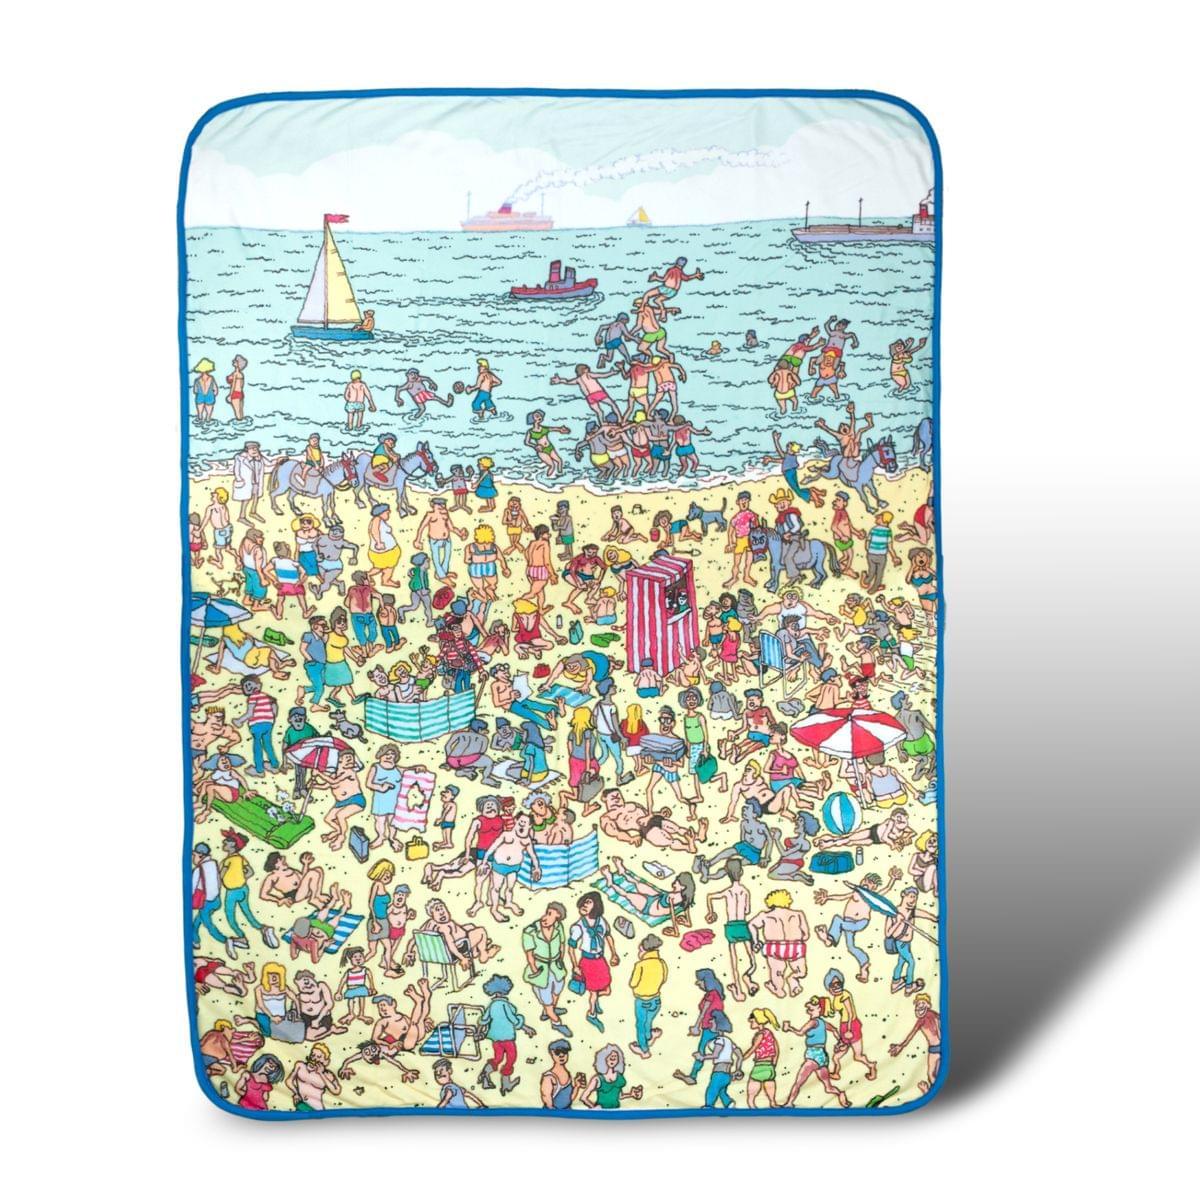 Where's Waldo On The Beach Lightweight Fleece Throw Blanket | 45 x 60 Inches